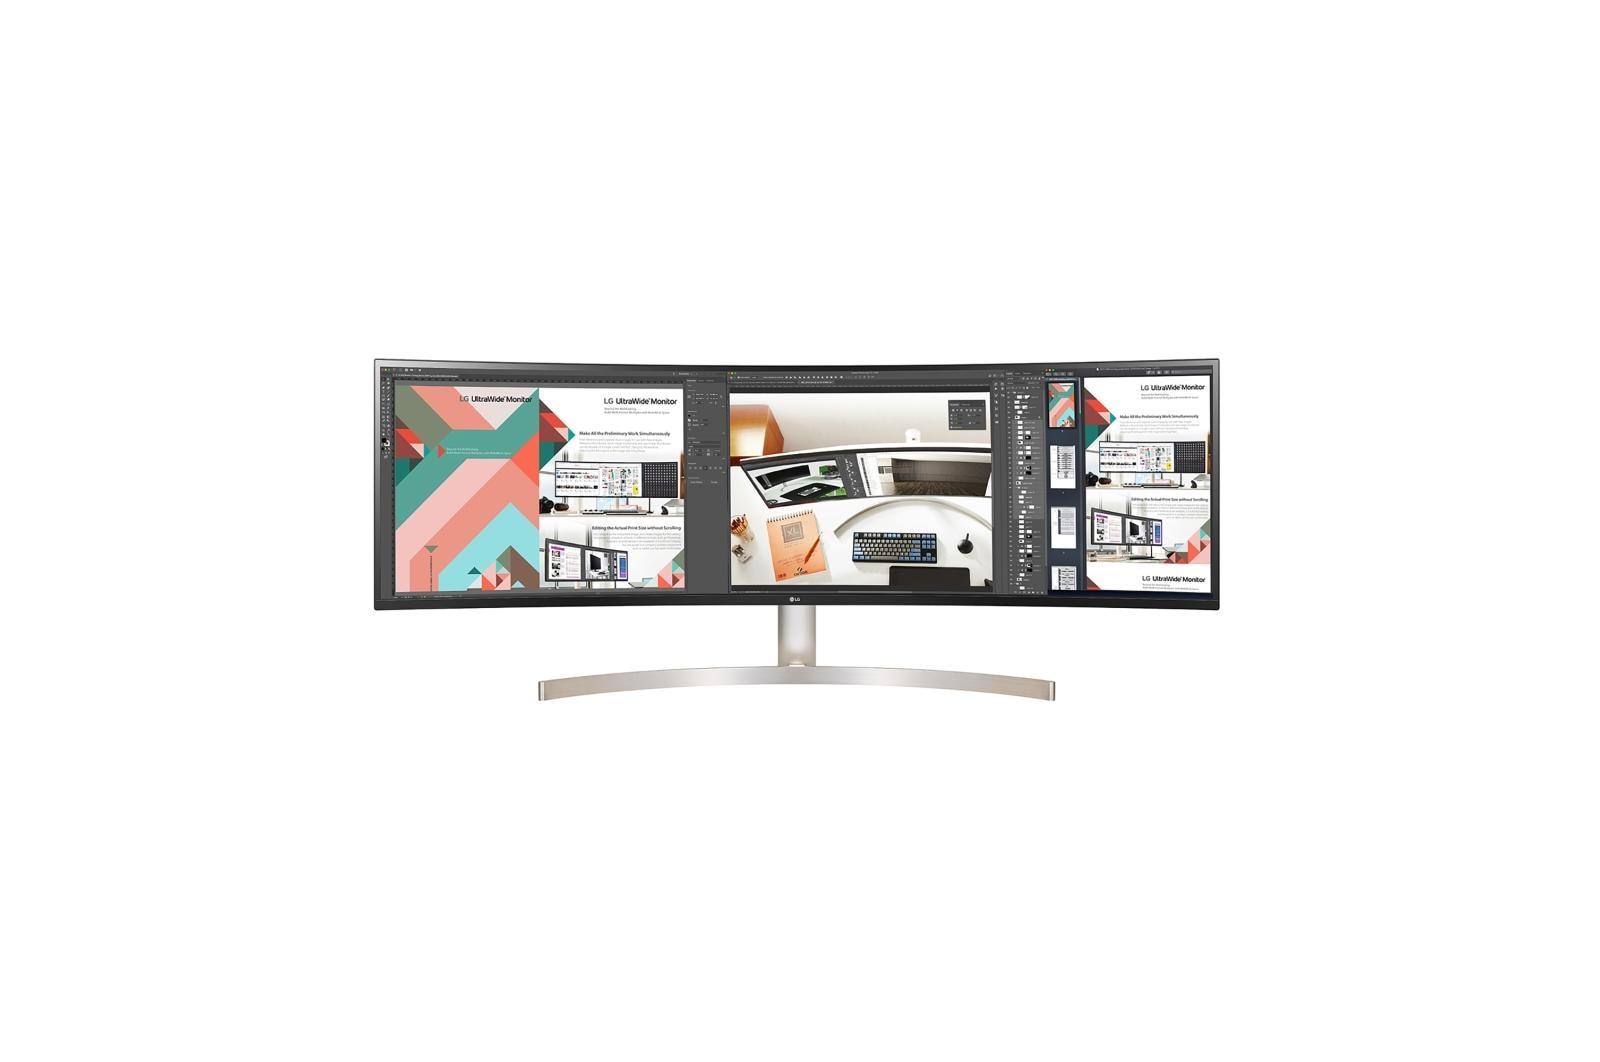 LG Consumer Monitors 49WL95C-W 1